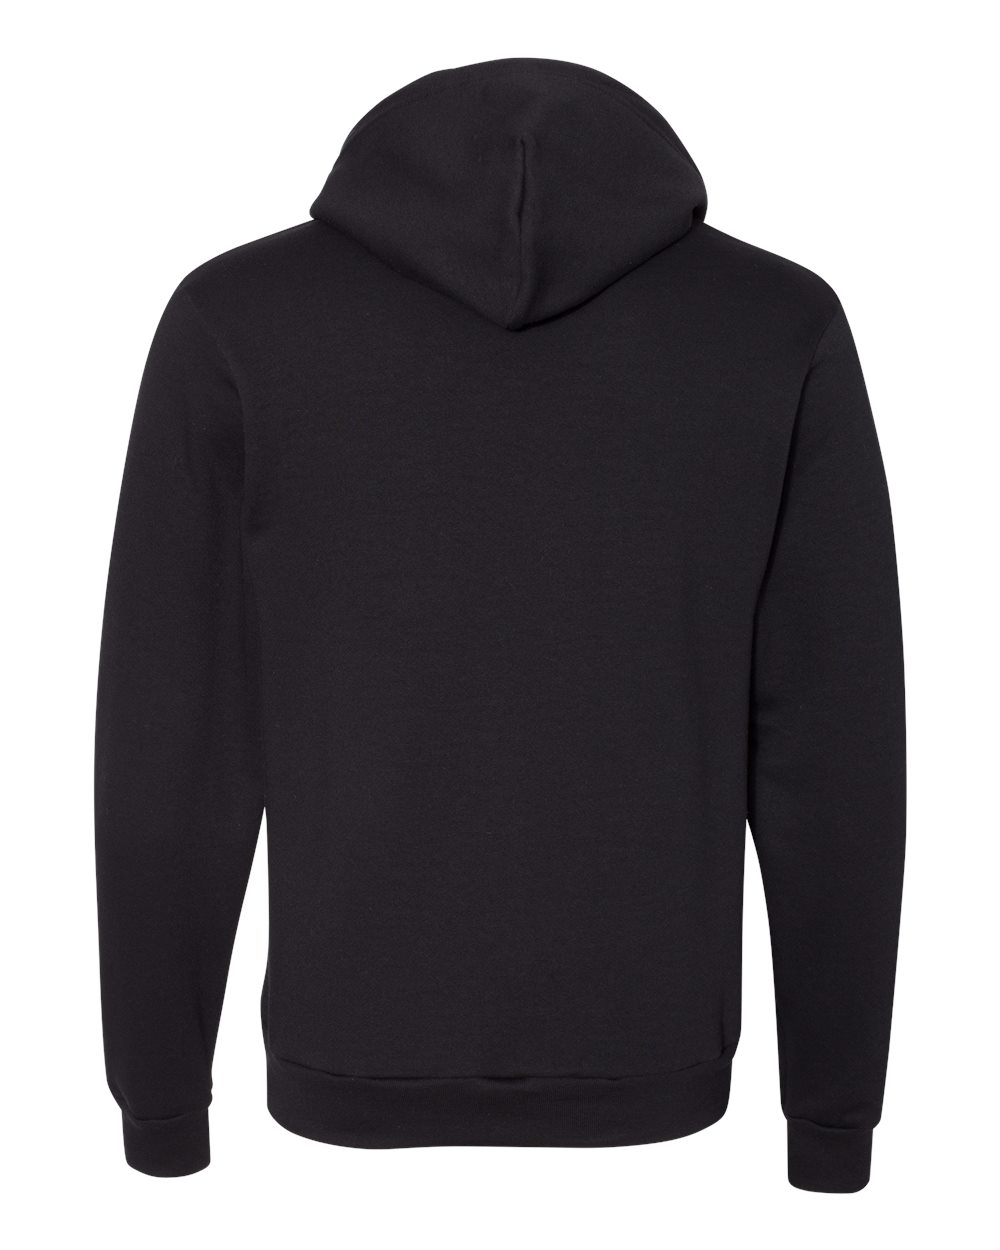 American-Apparel-Flex-Fleece-Unisex-Full-Zip-Hoodie-Blank-F497W-up-to-3XL thumbnail 7